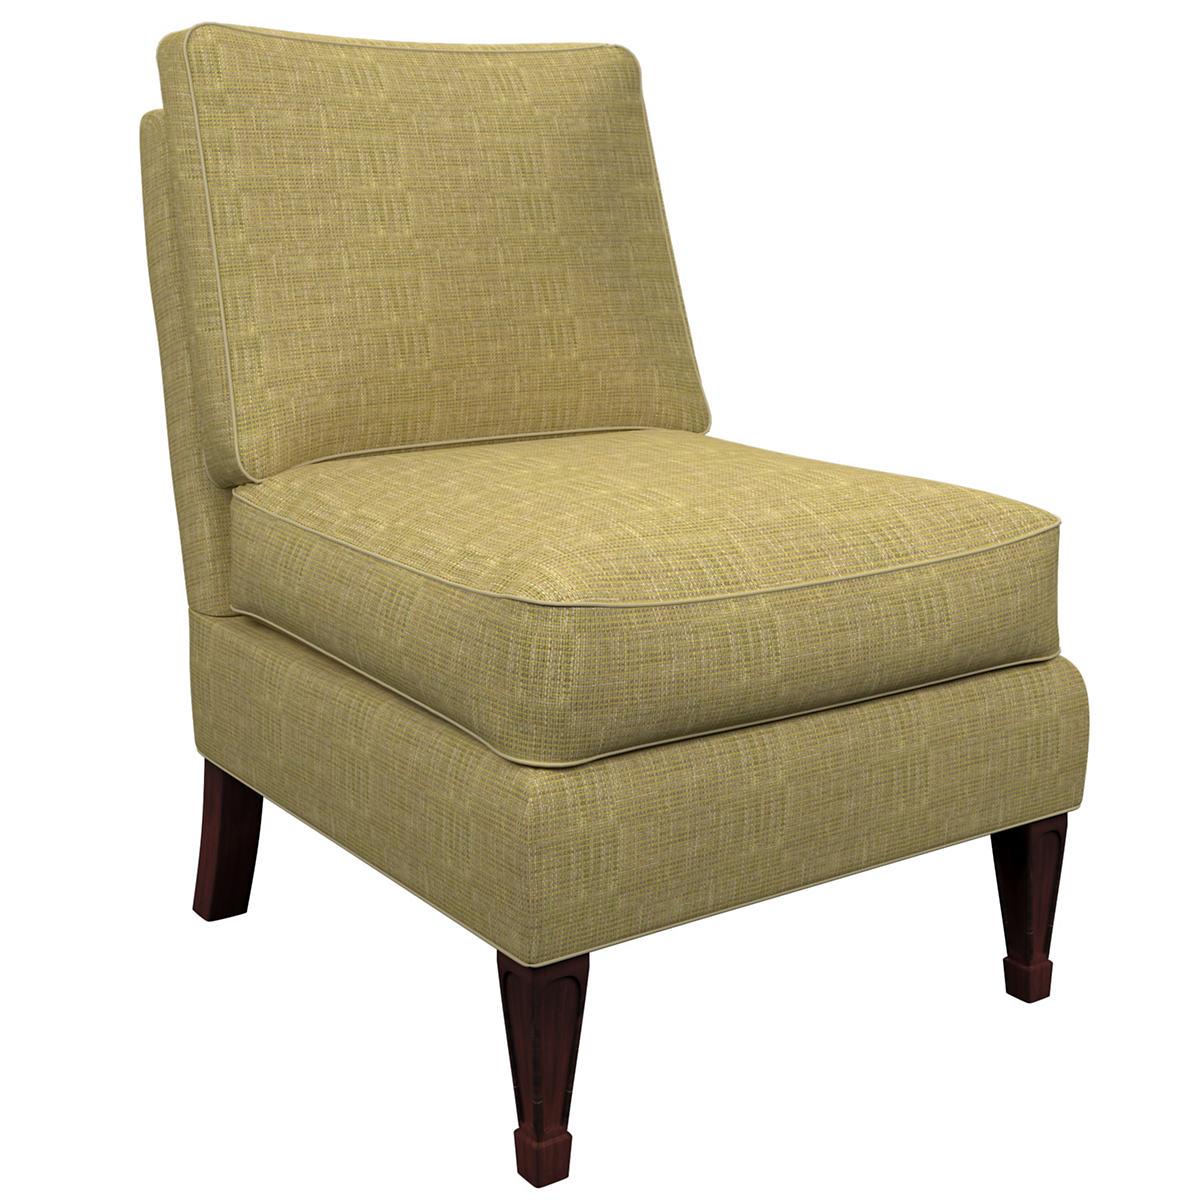 Heritage Chartreuse Eldorado Chair